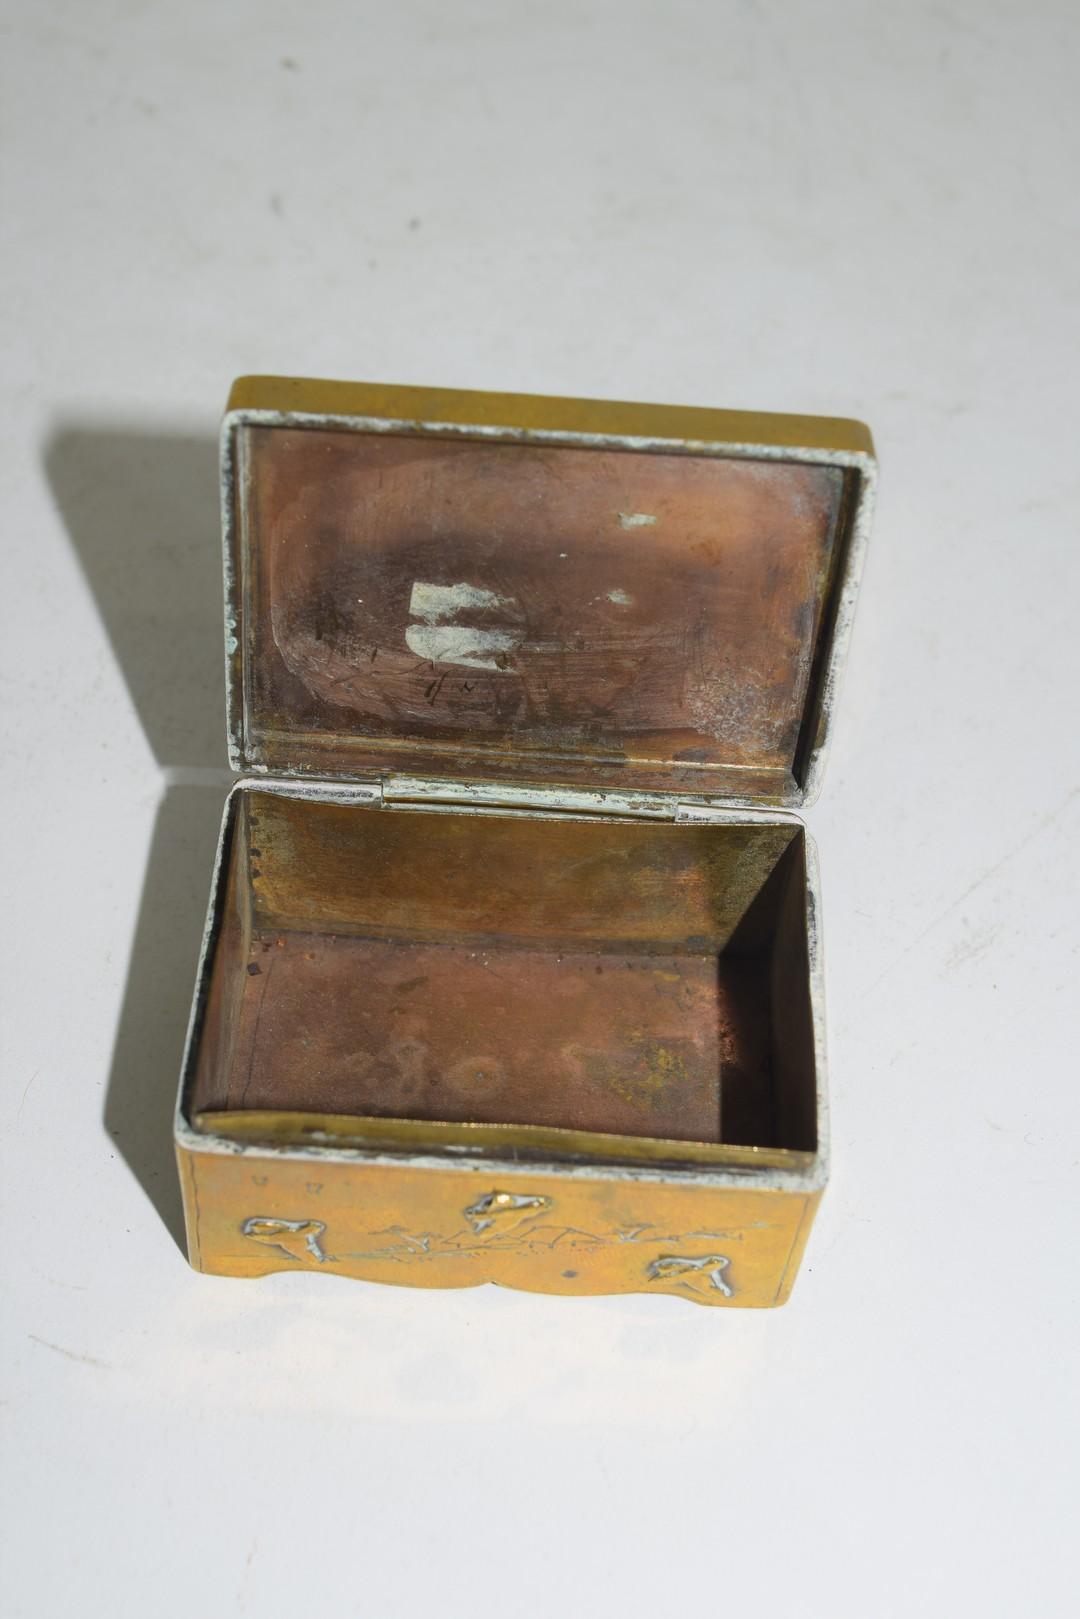 Small Chinese brass box - Image 6 of 6